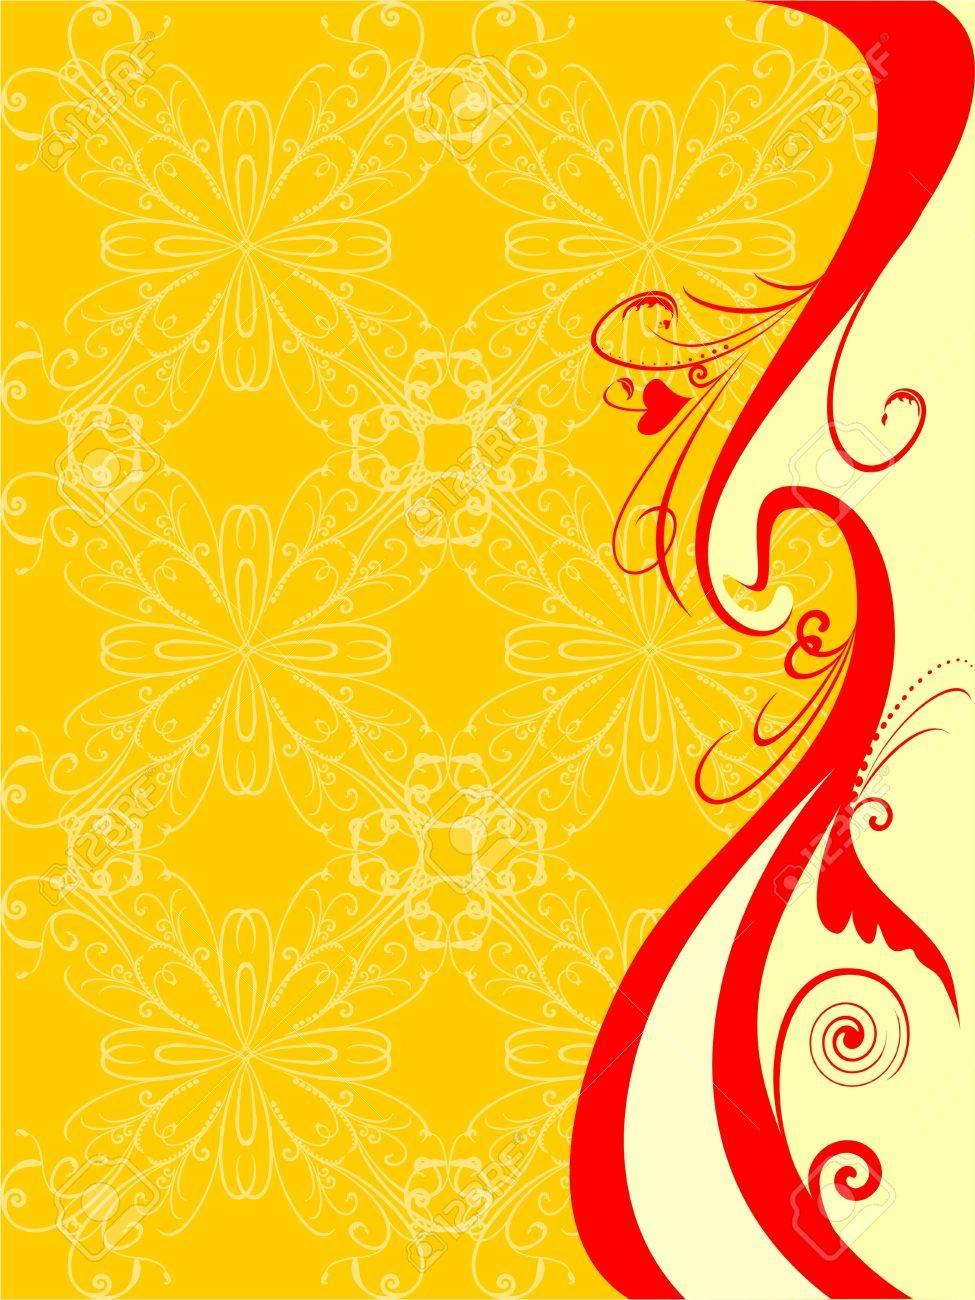 floral pattern - 10748474